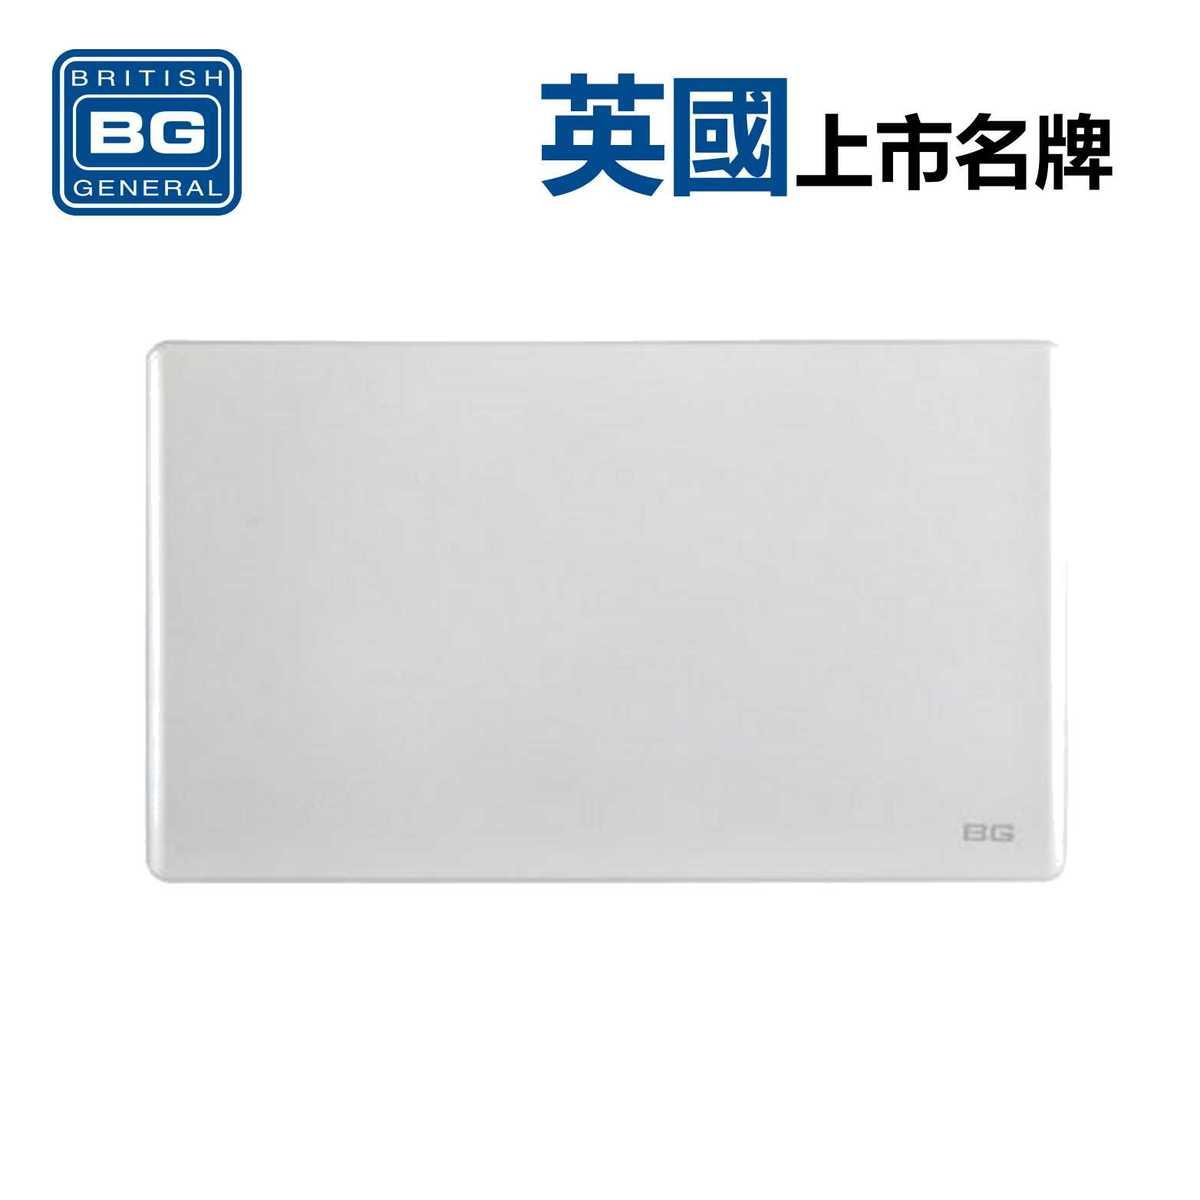 2-Gang Blank - White (Model: PCWH95)